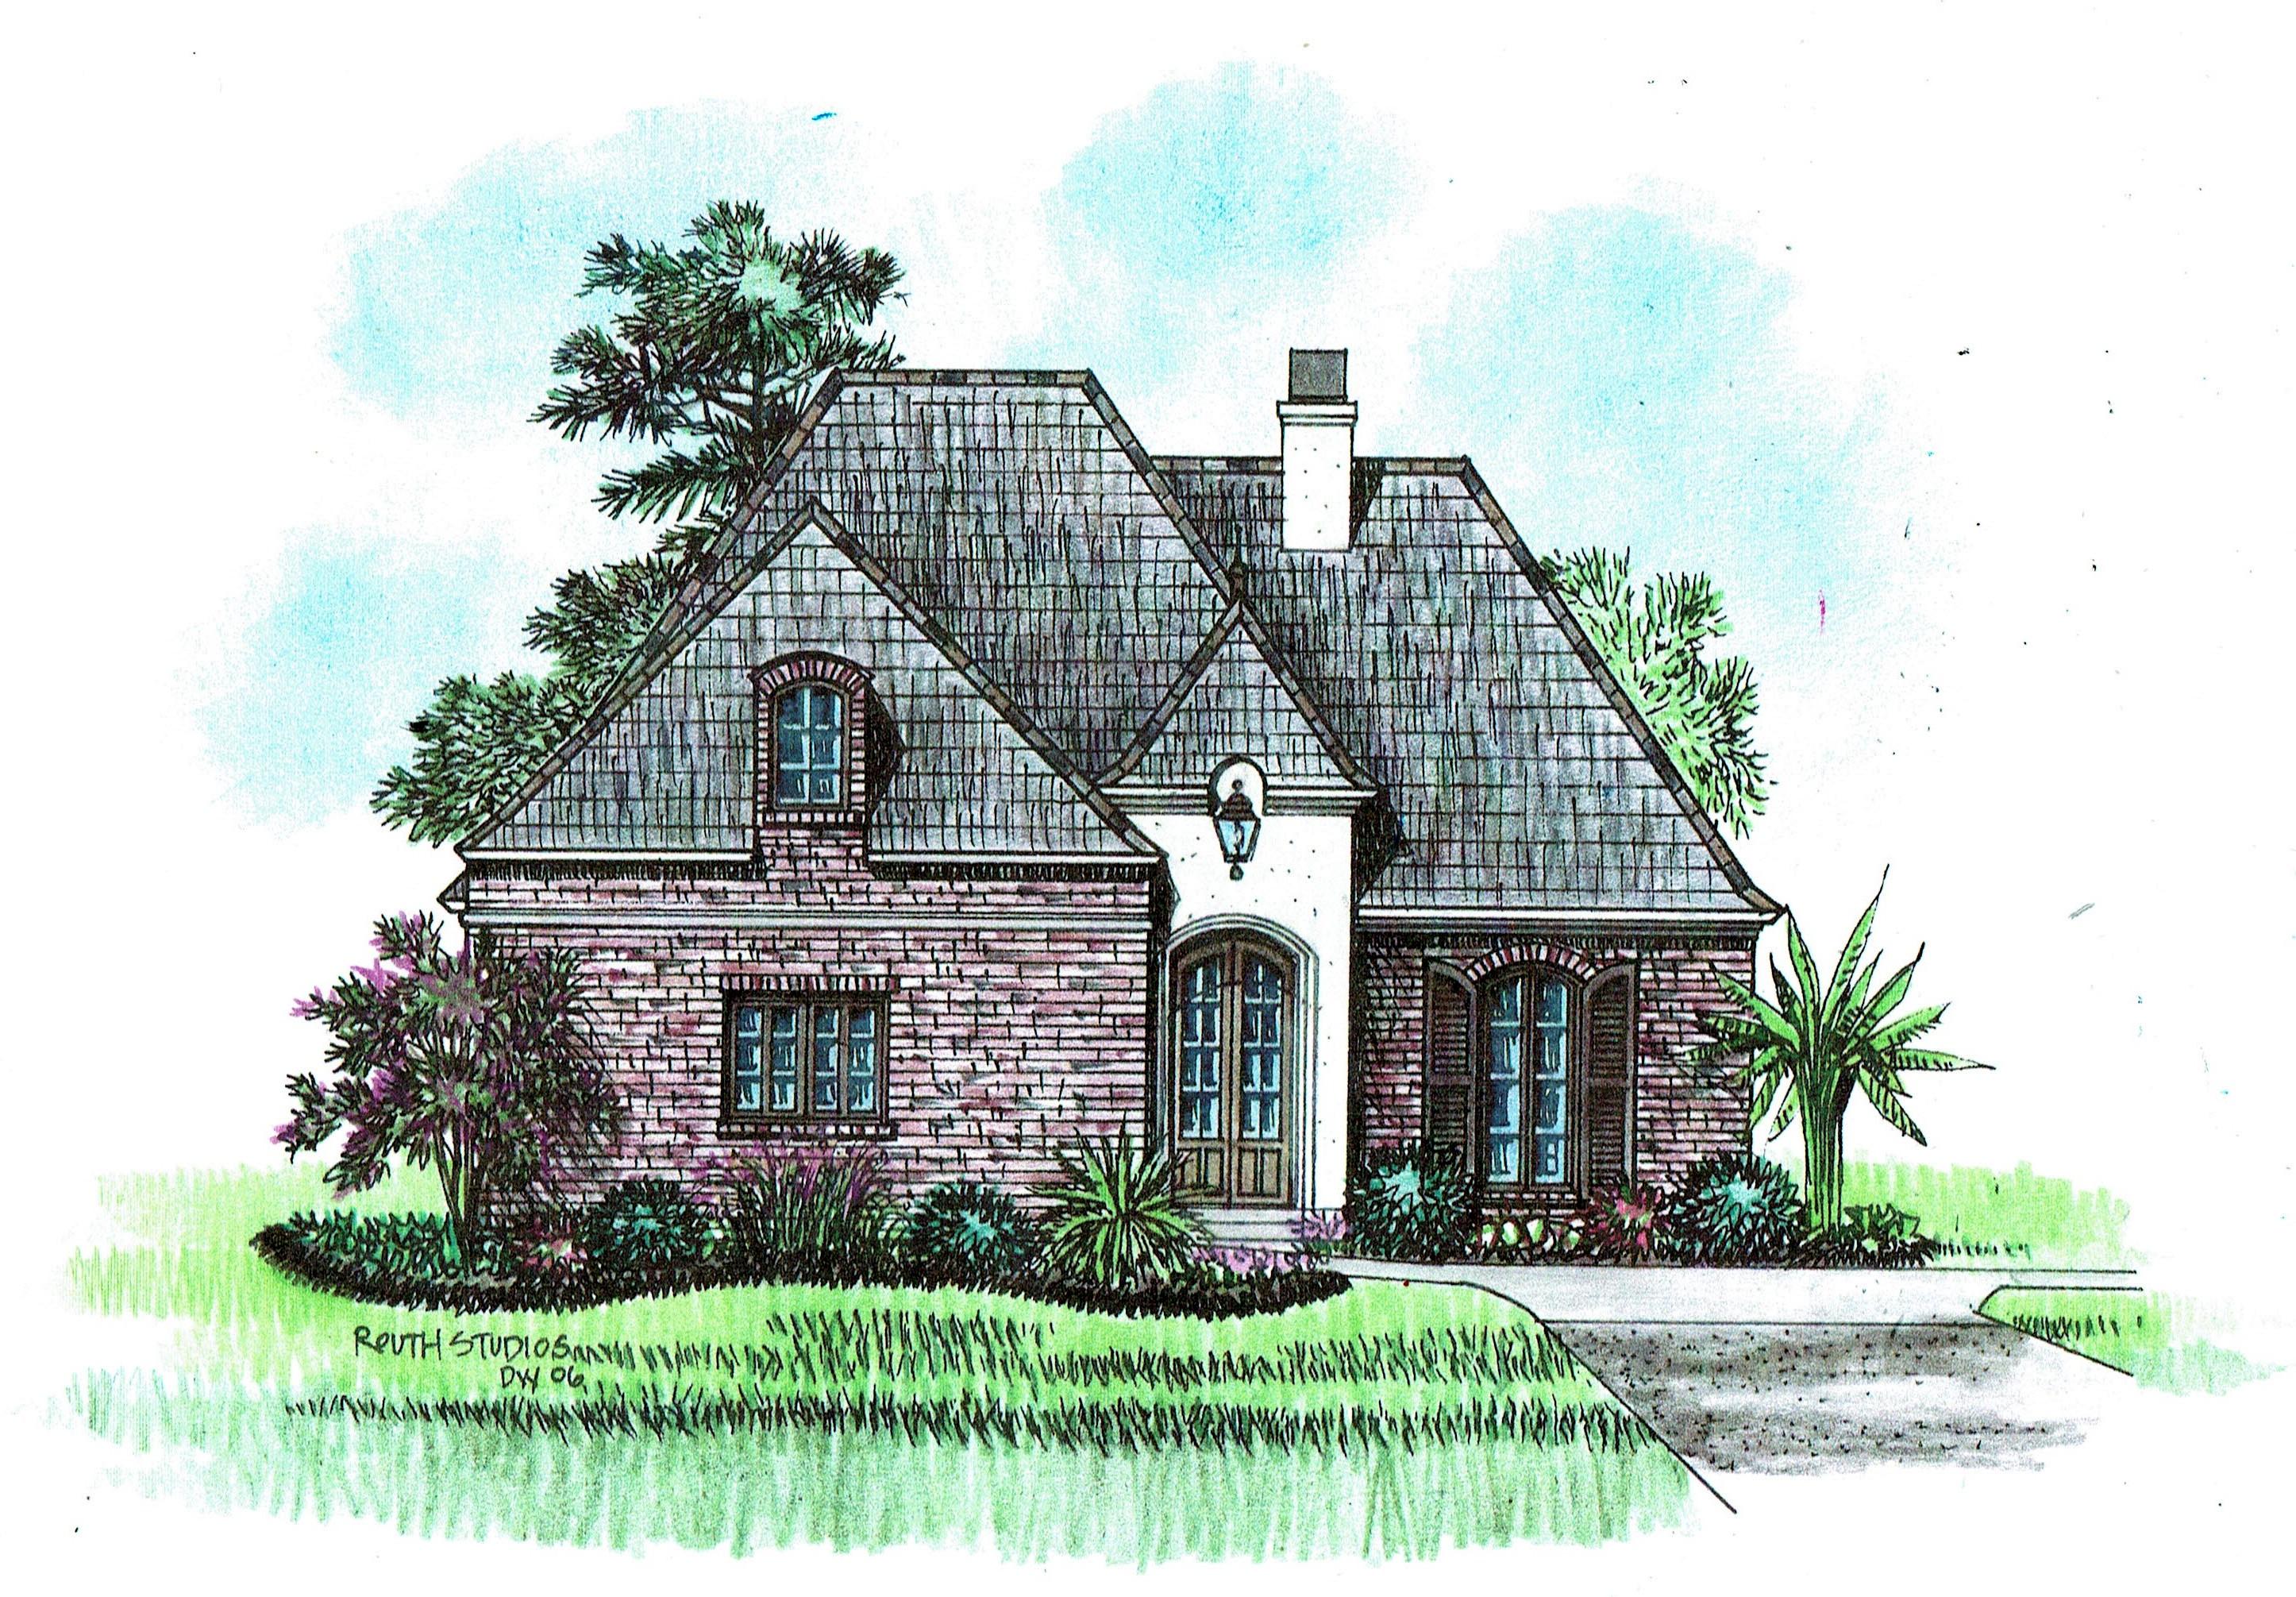 2500 3000 sq ft acadiana home design for Acadiana home design